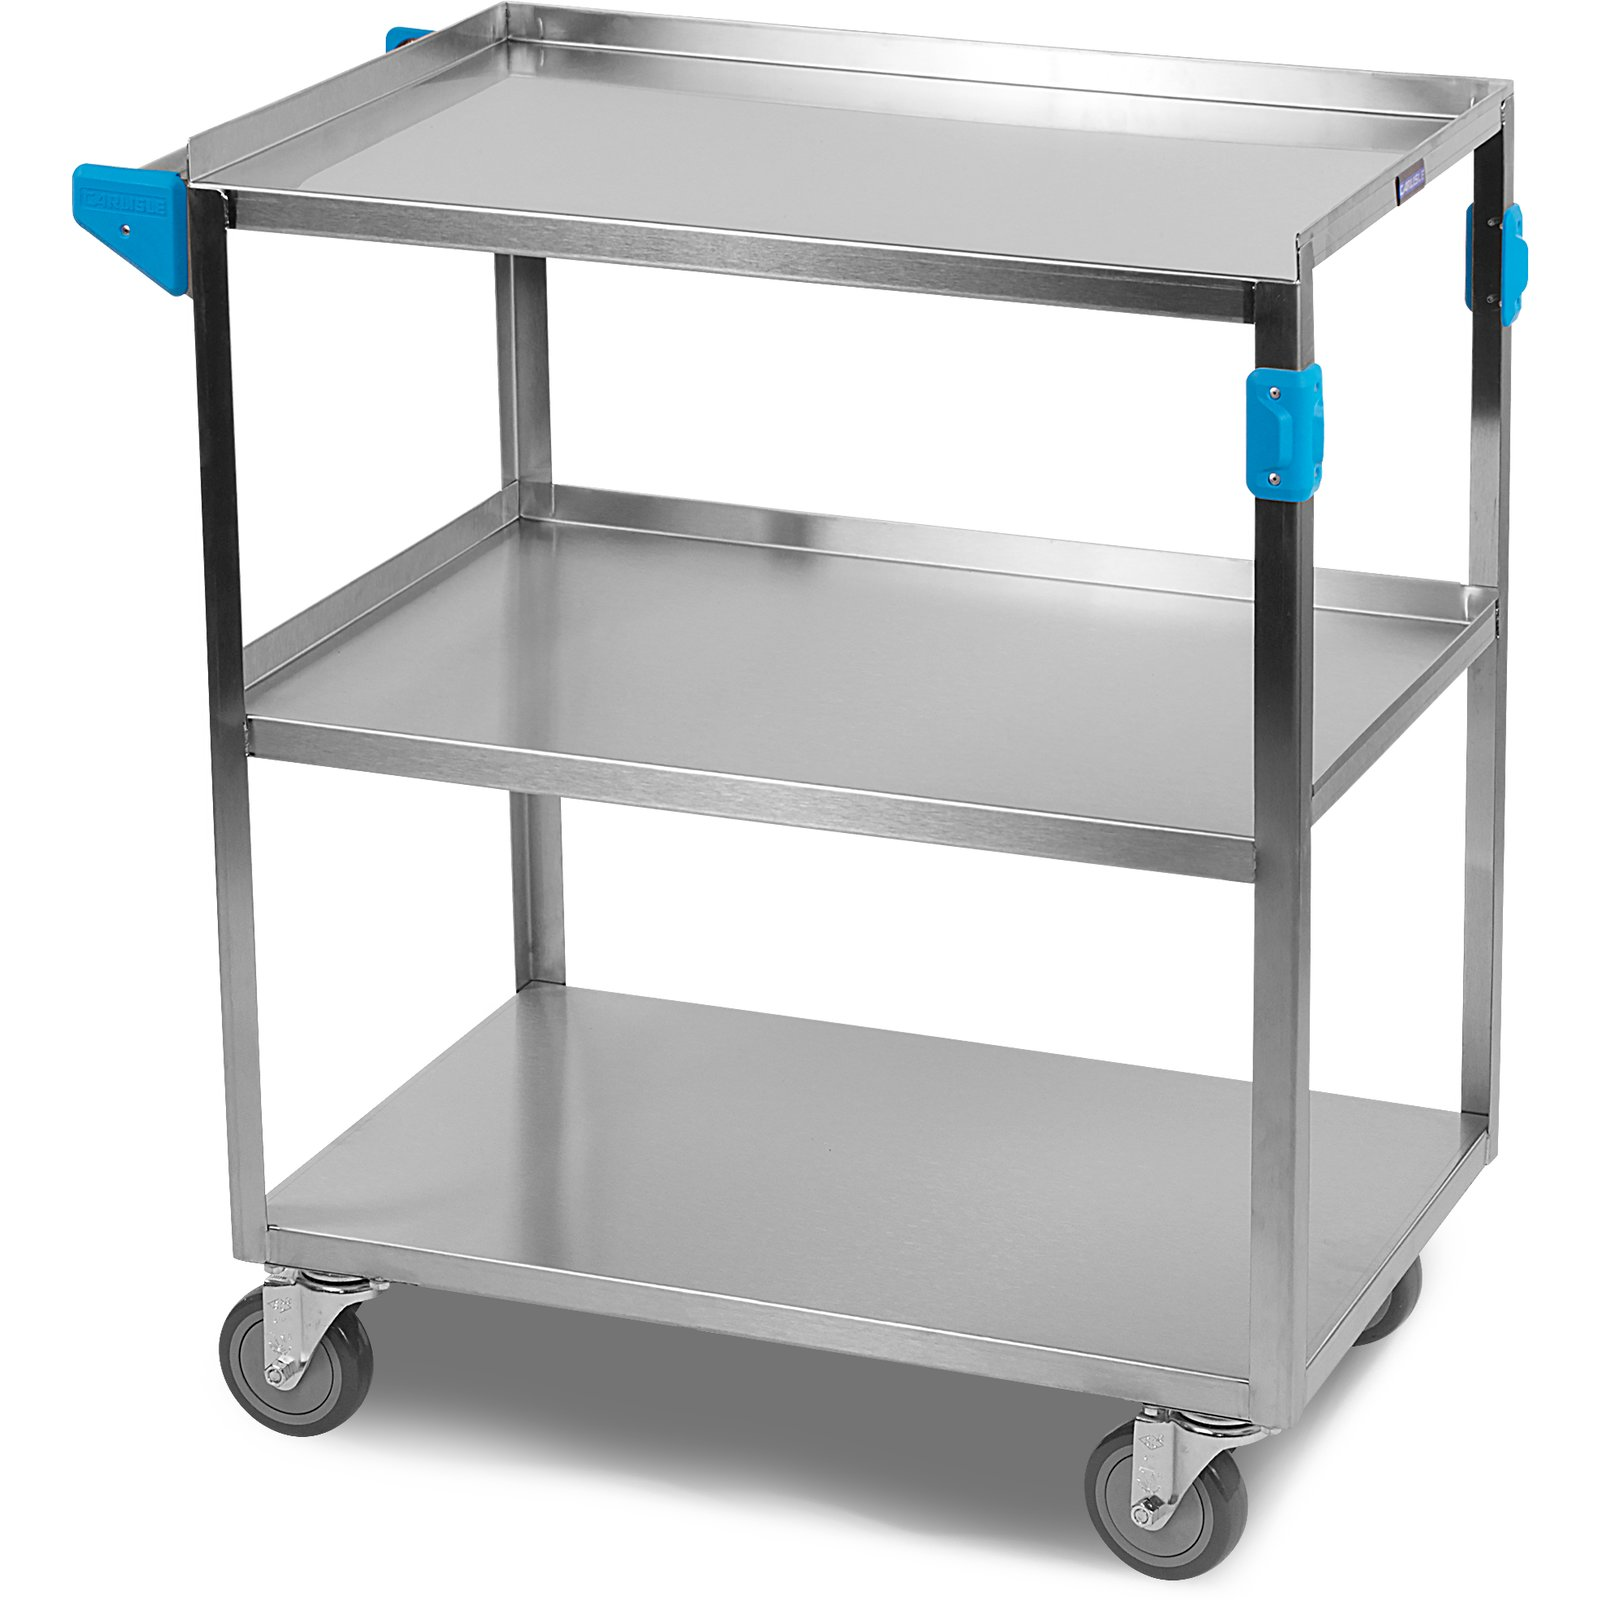 UC3031827 - Stainless Steel 3 Shelf Utility Cart 17.9\